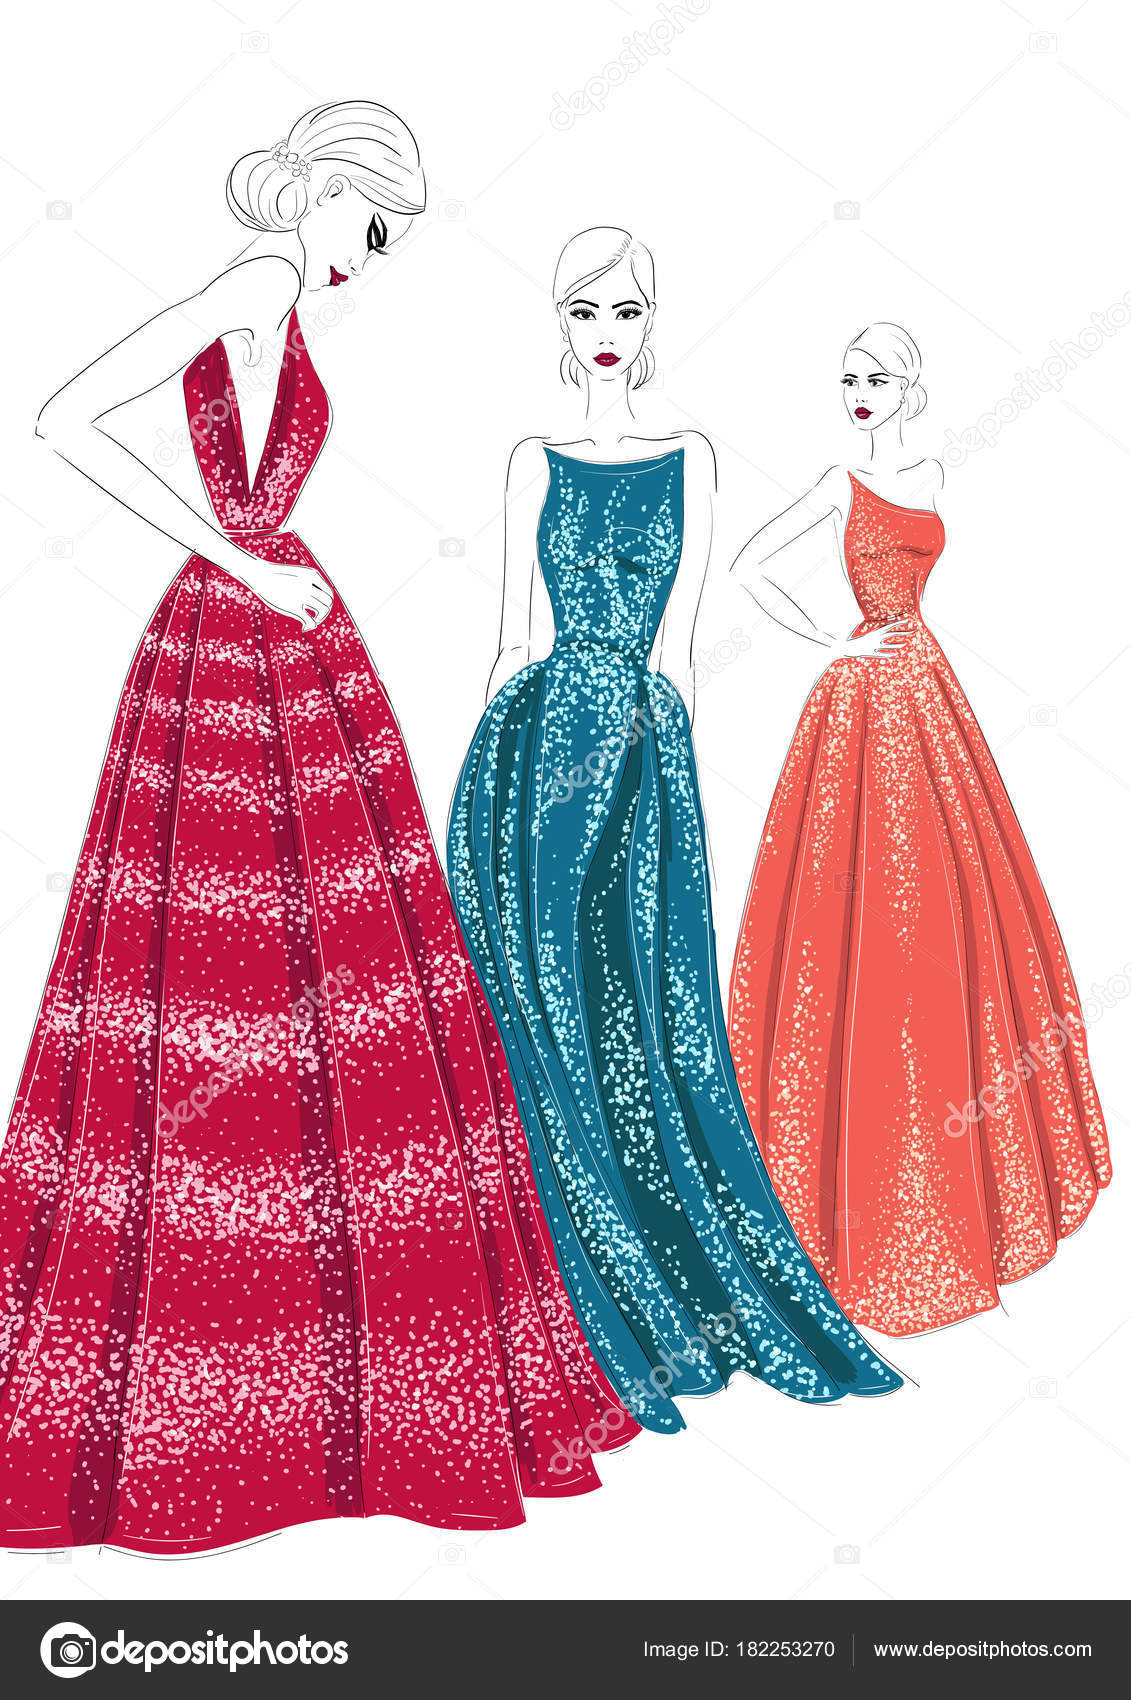 Modelos De CosturaTres Vestidos CosturaTres IlustracionAlta Modelos IlustracionAlta 35RLAqj4